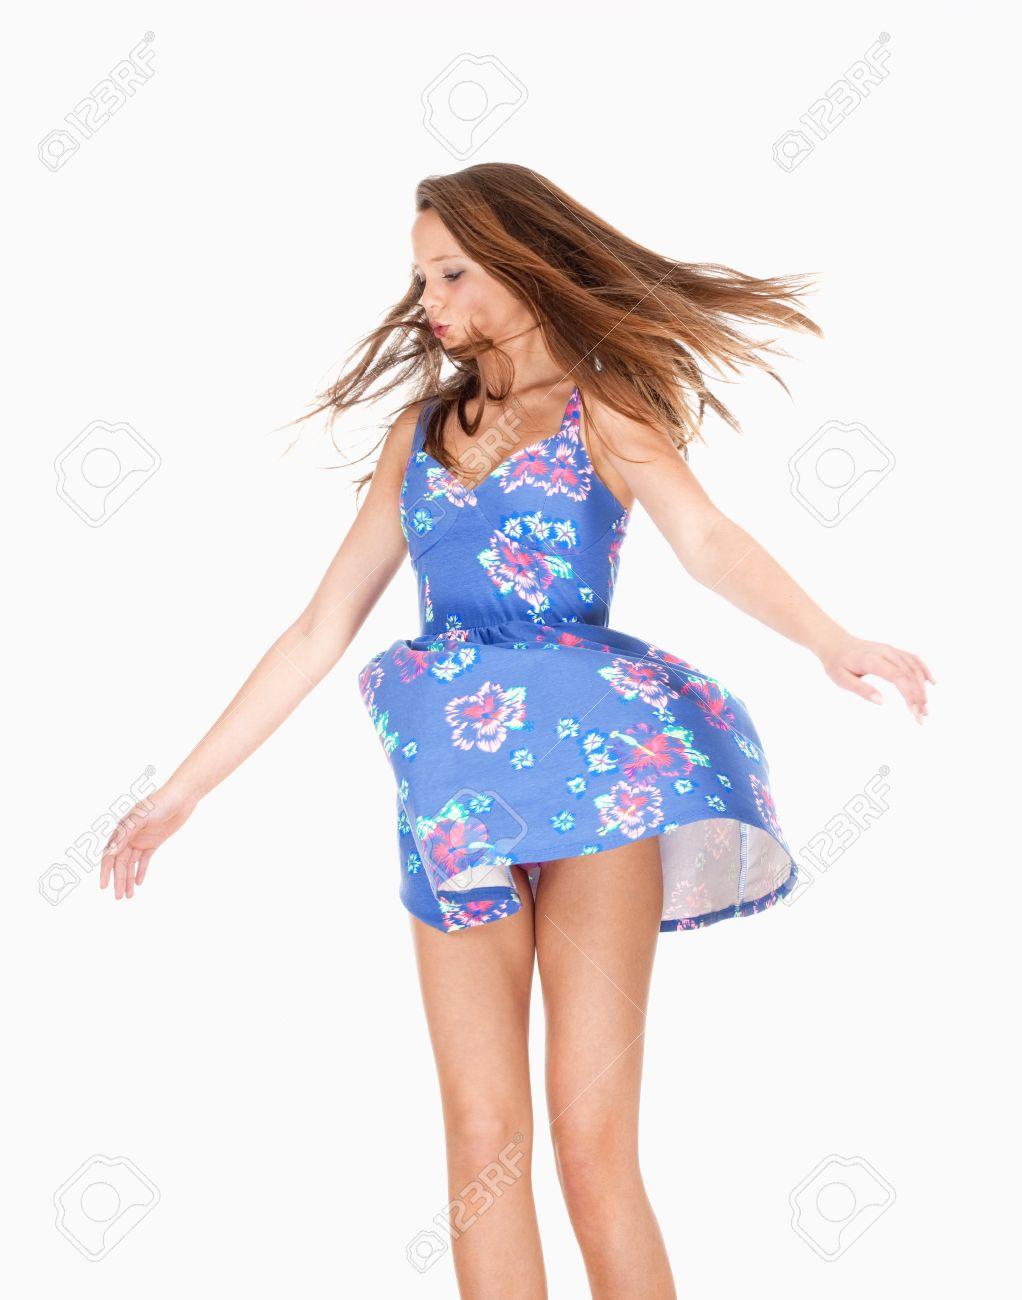 Girls lifting up skirts